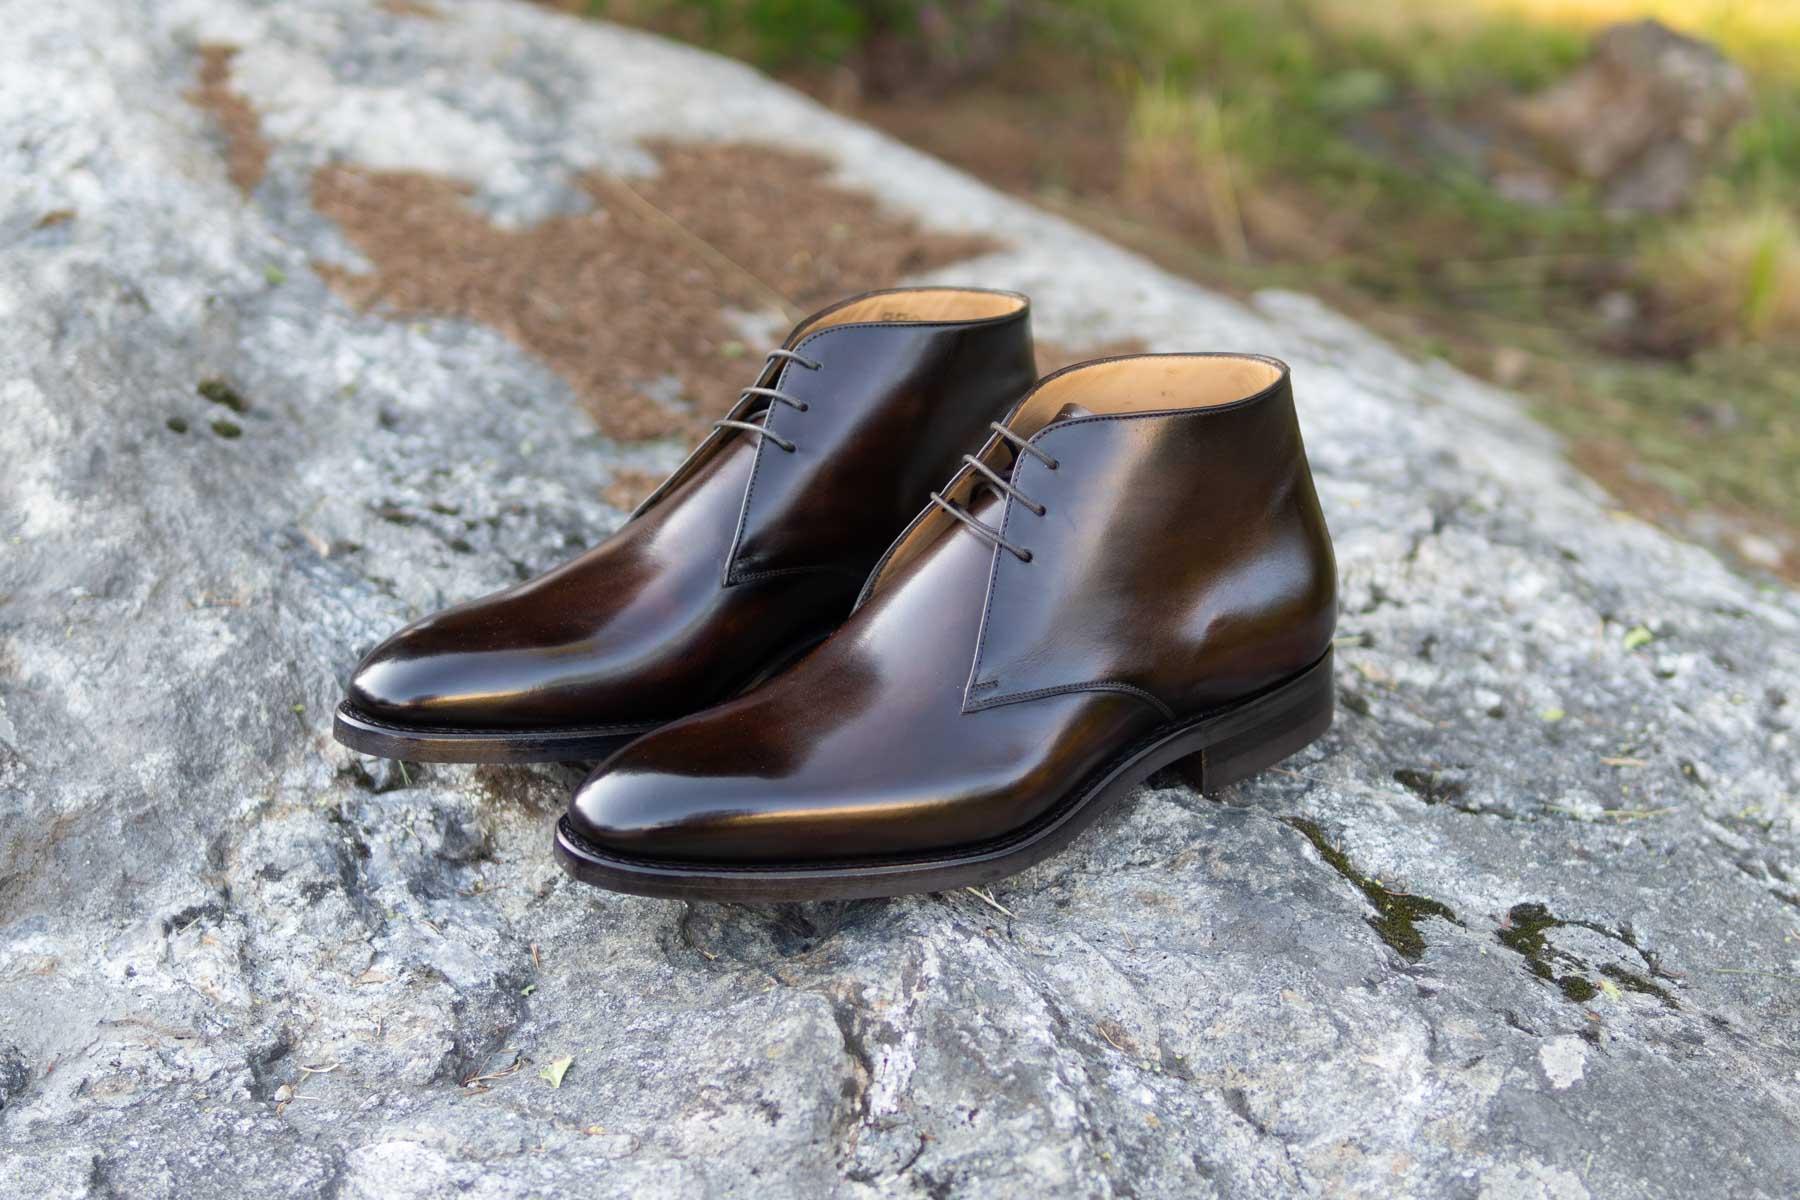 Carlos Santos 7991 Chukka Boots in Coimbra Patina for The Noble Shoe 4